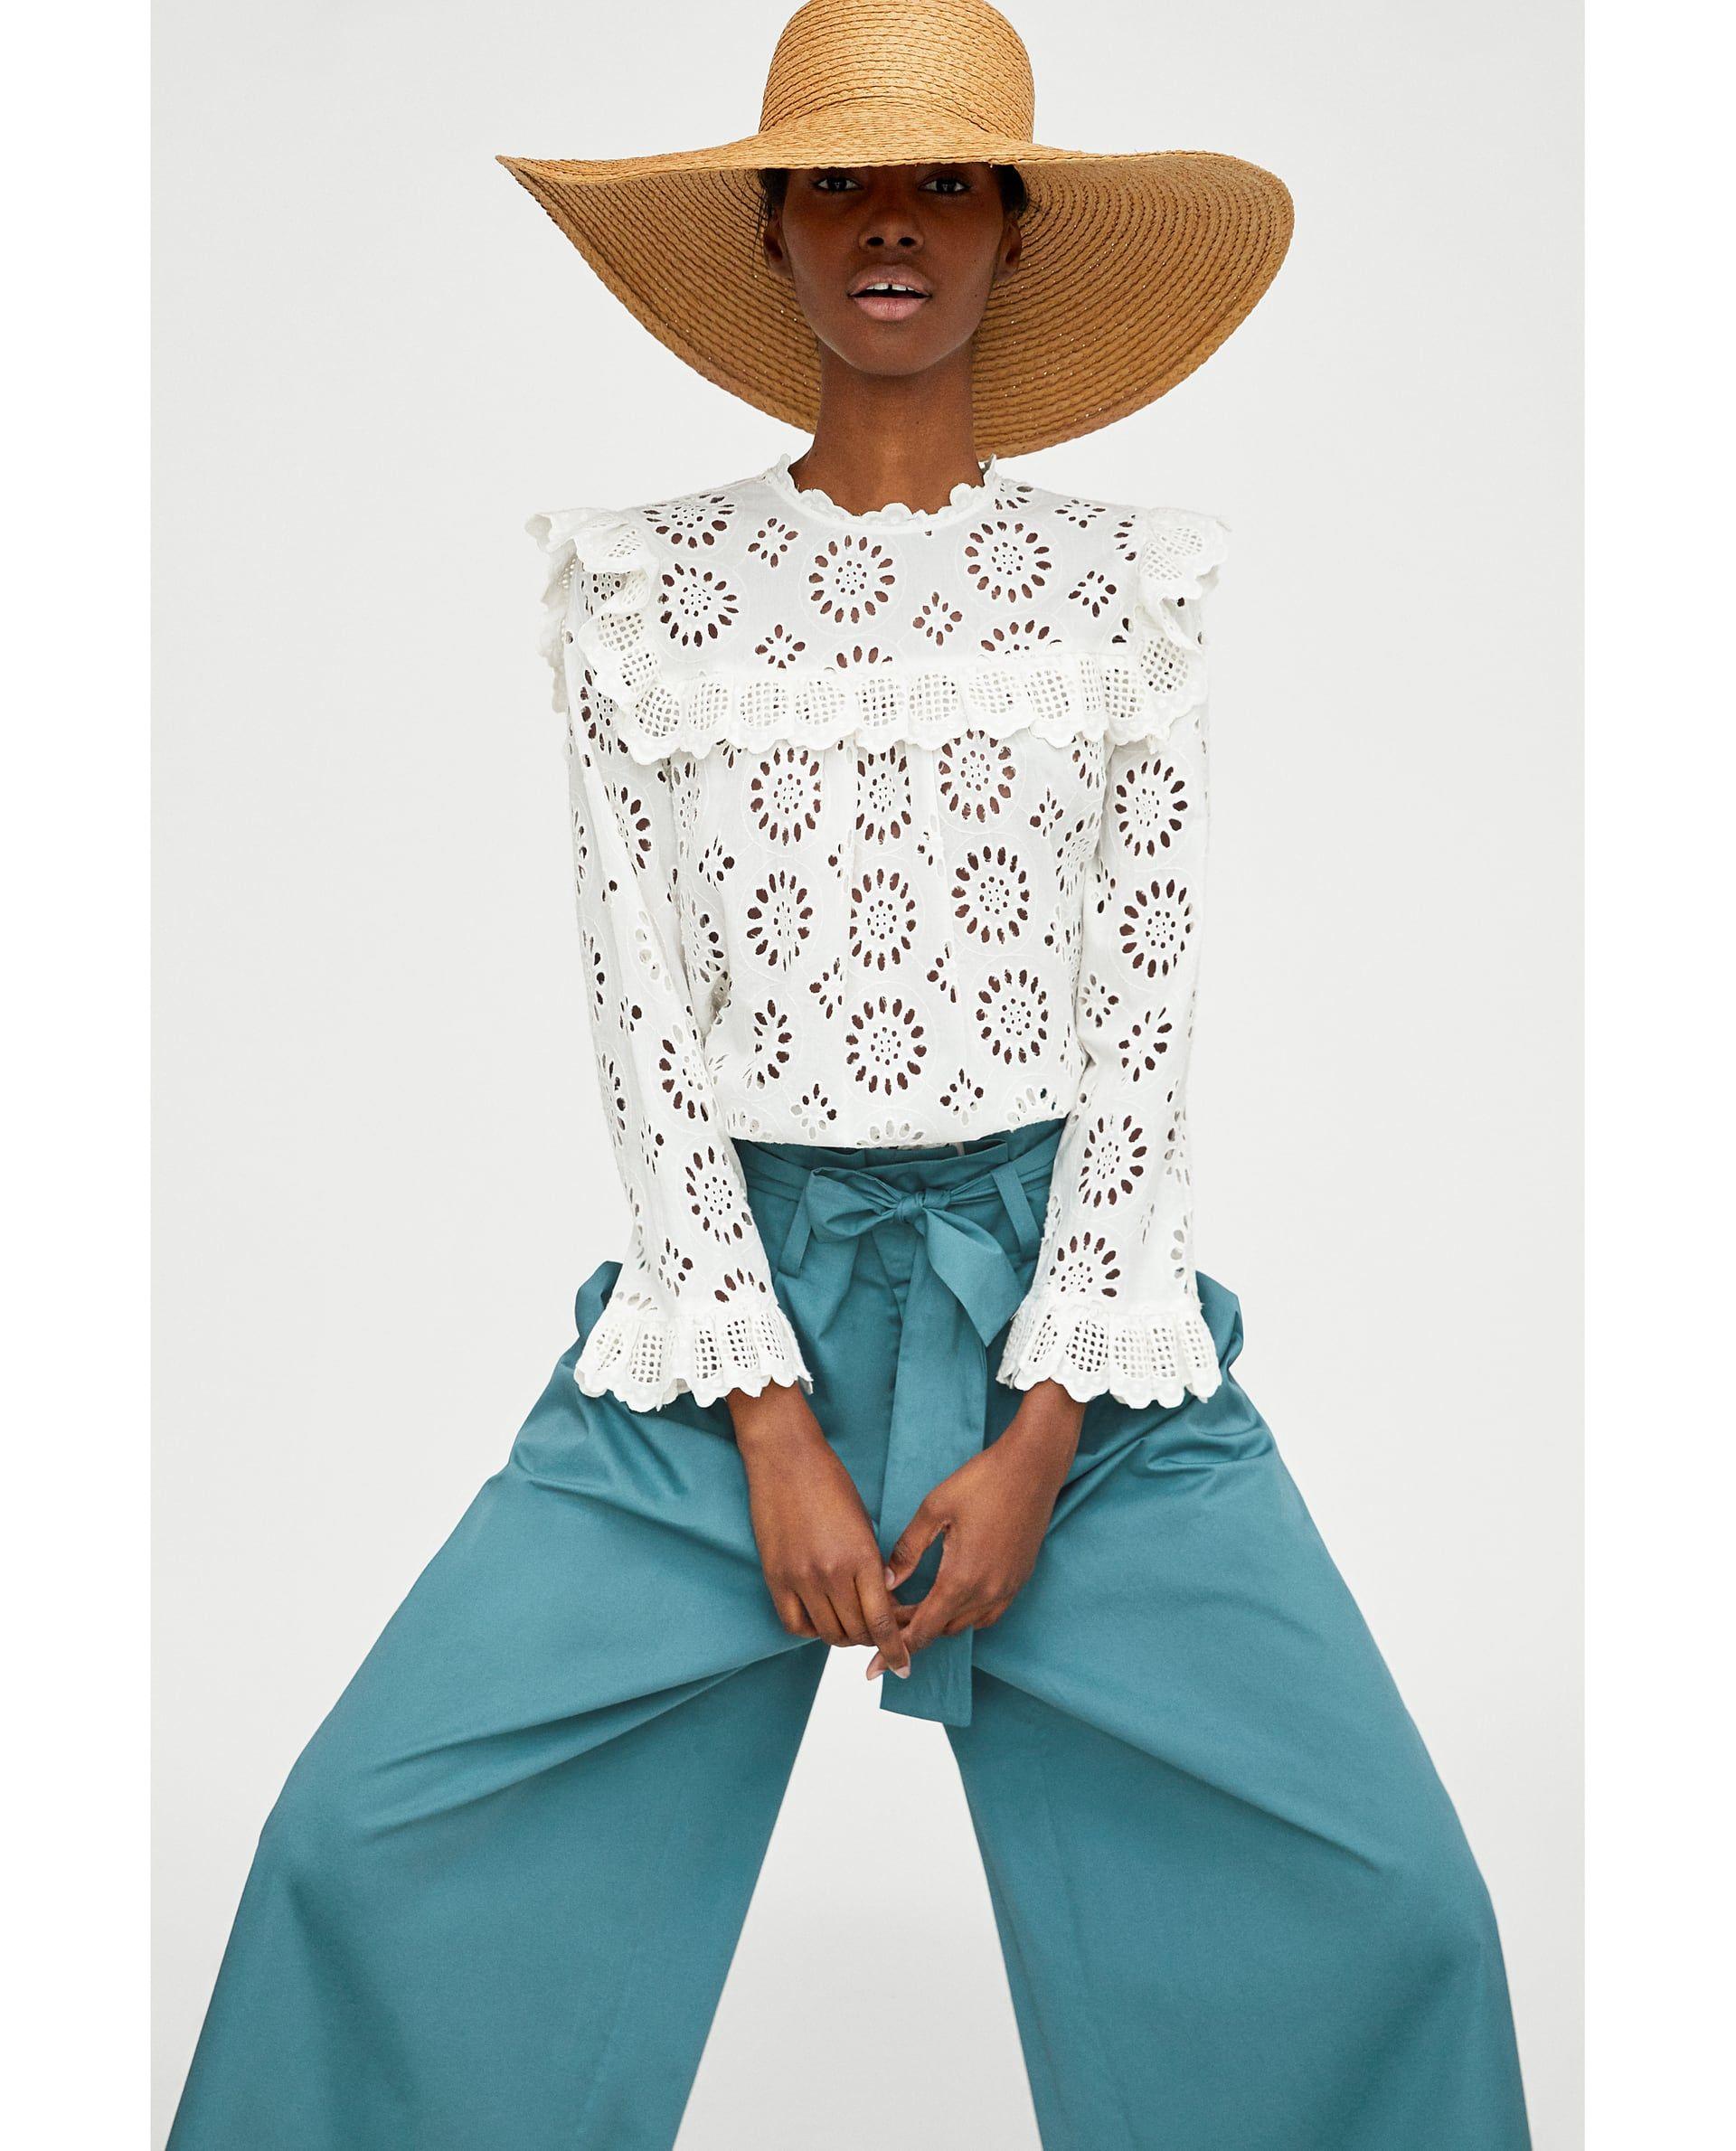 5bf9448b BLOUSE MET OPENGEWERKT BORDUURSEL   Fashion weeks   Zara outfit ...